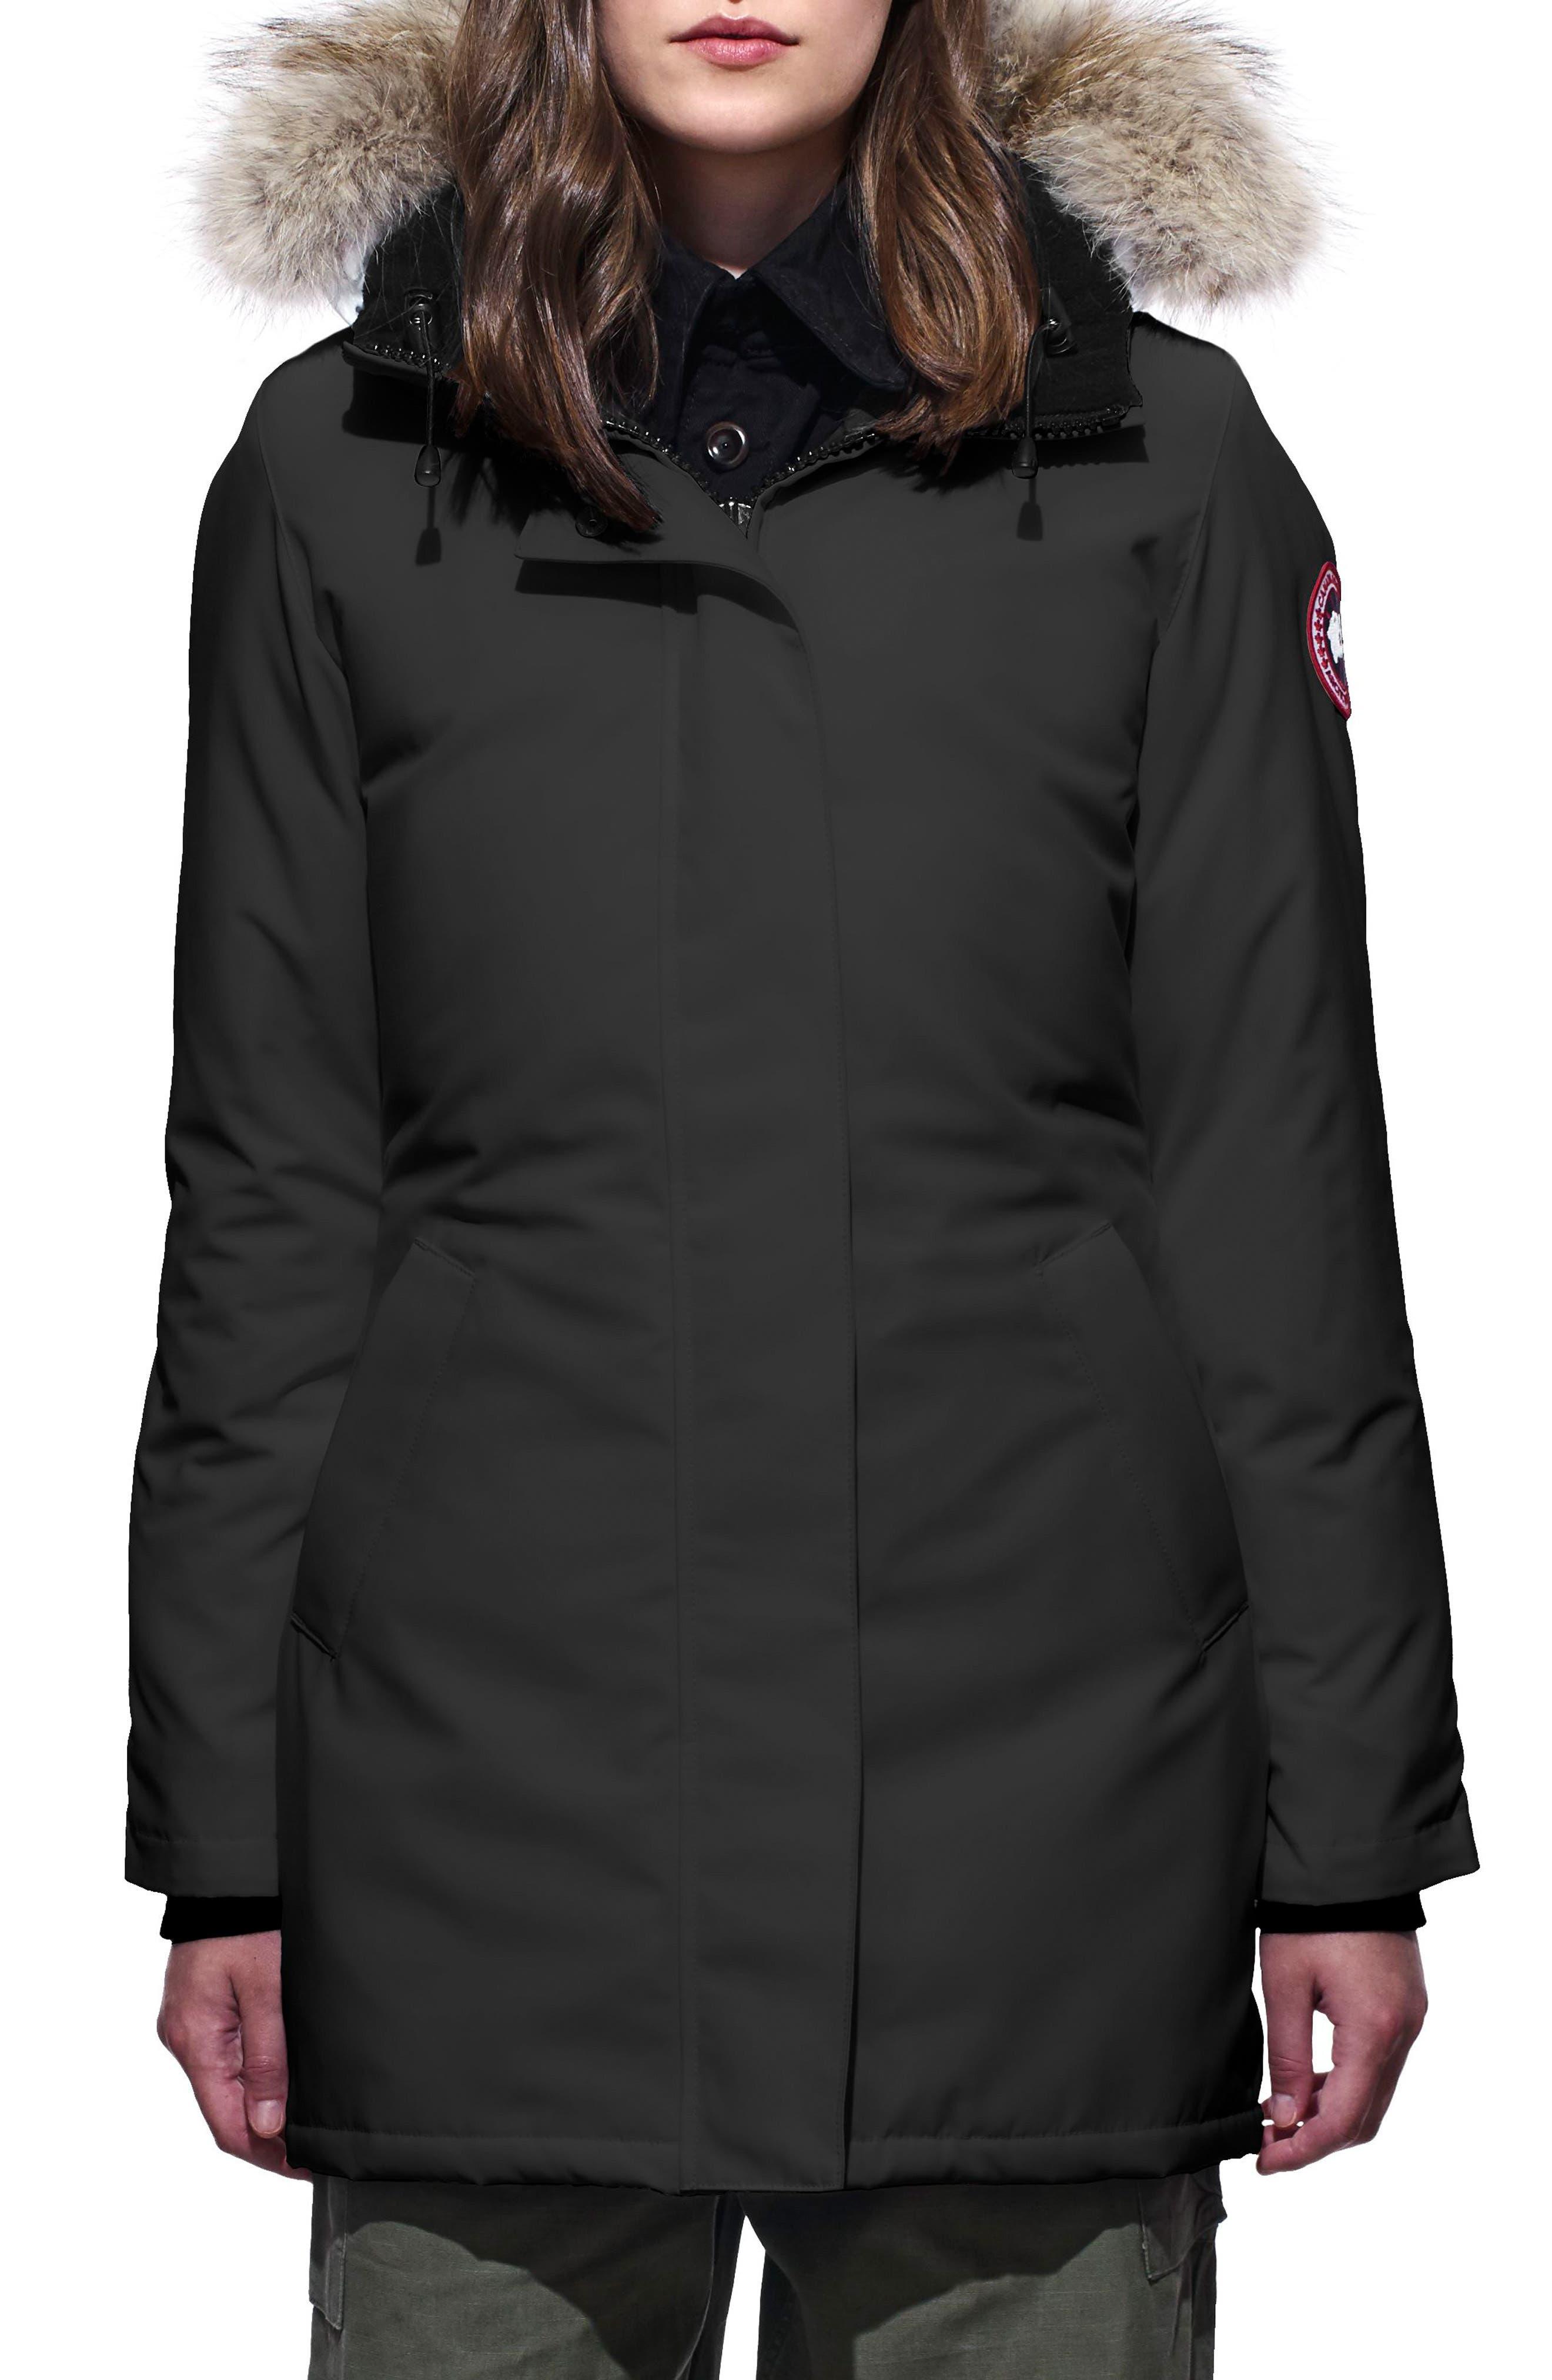 Petite Canada Goose Victoria Fusion Fit Down Parka With Genuine Coyote Fur Trim, P (000-00P) - Black